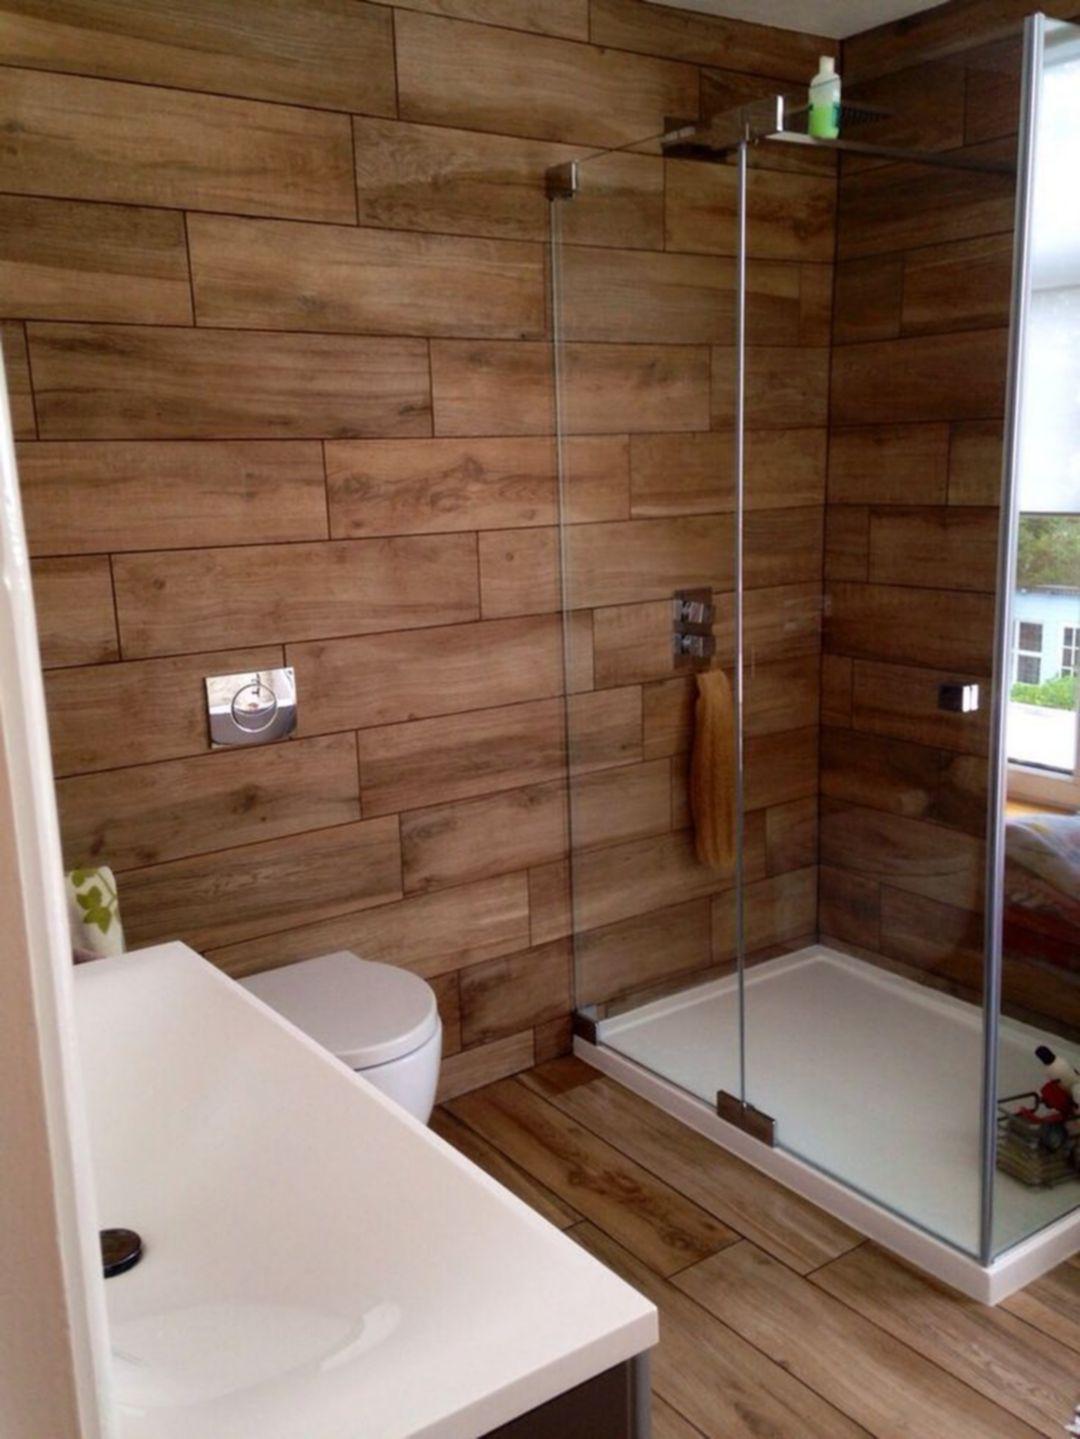 Cool 35 Awesome Wood Tile Bathroom Ideas